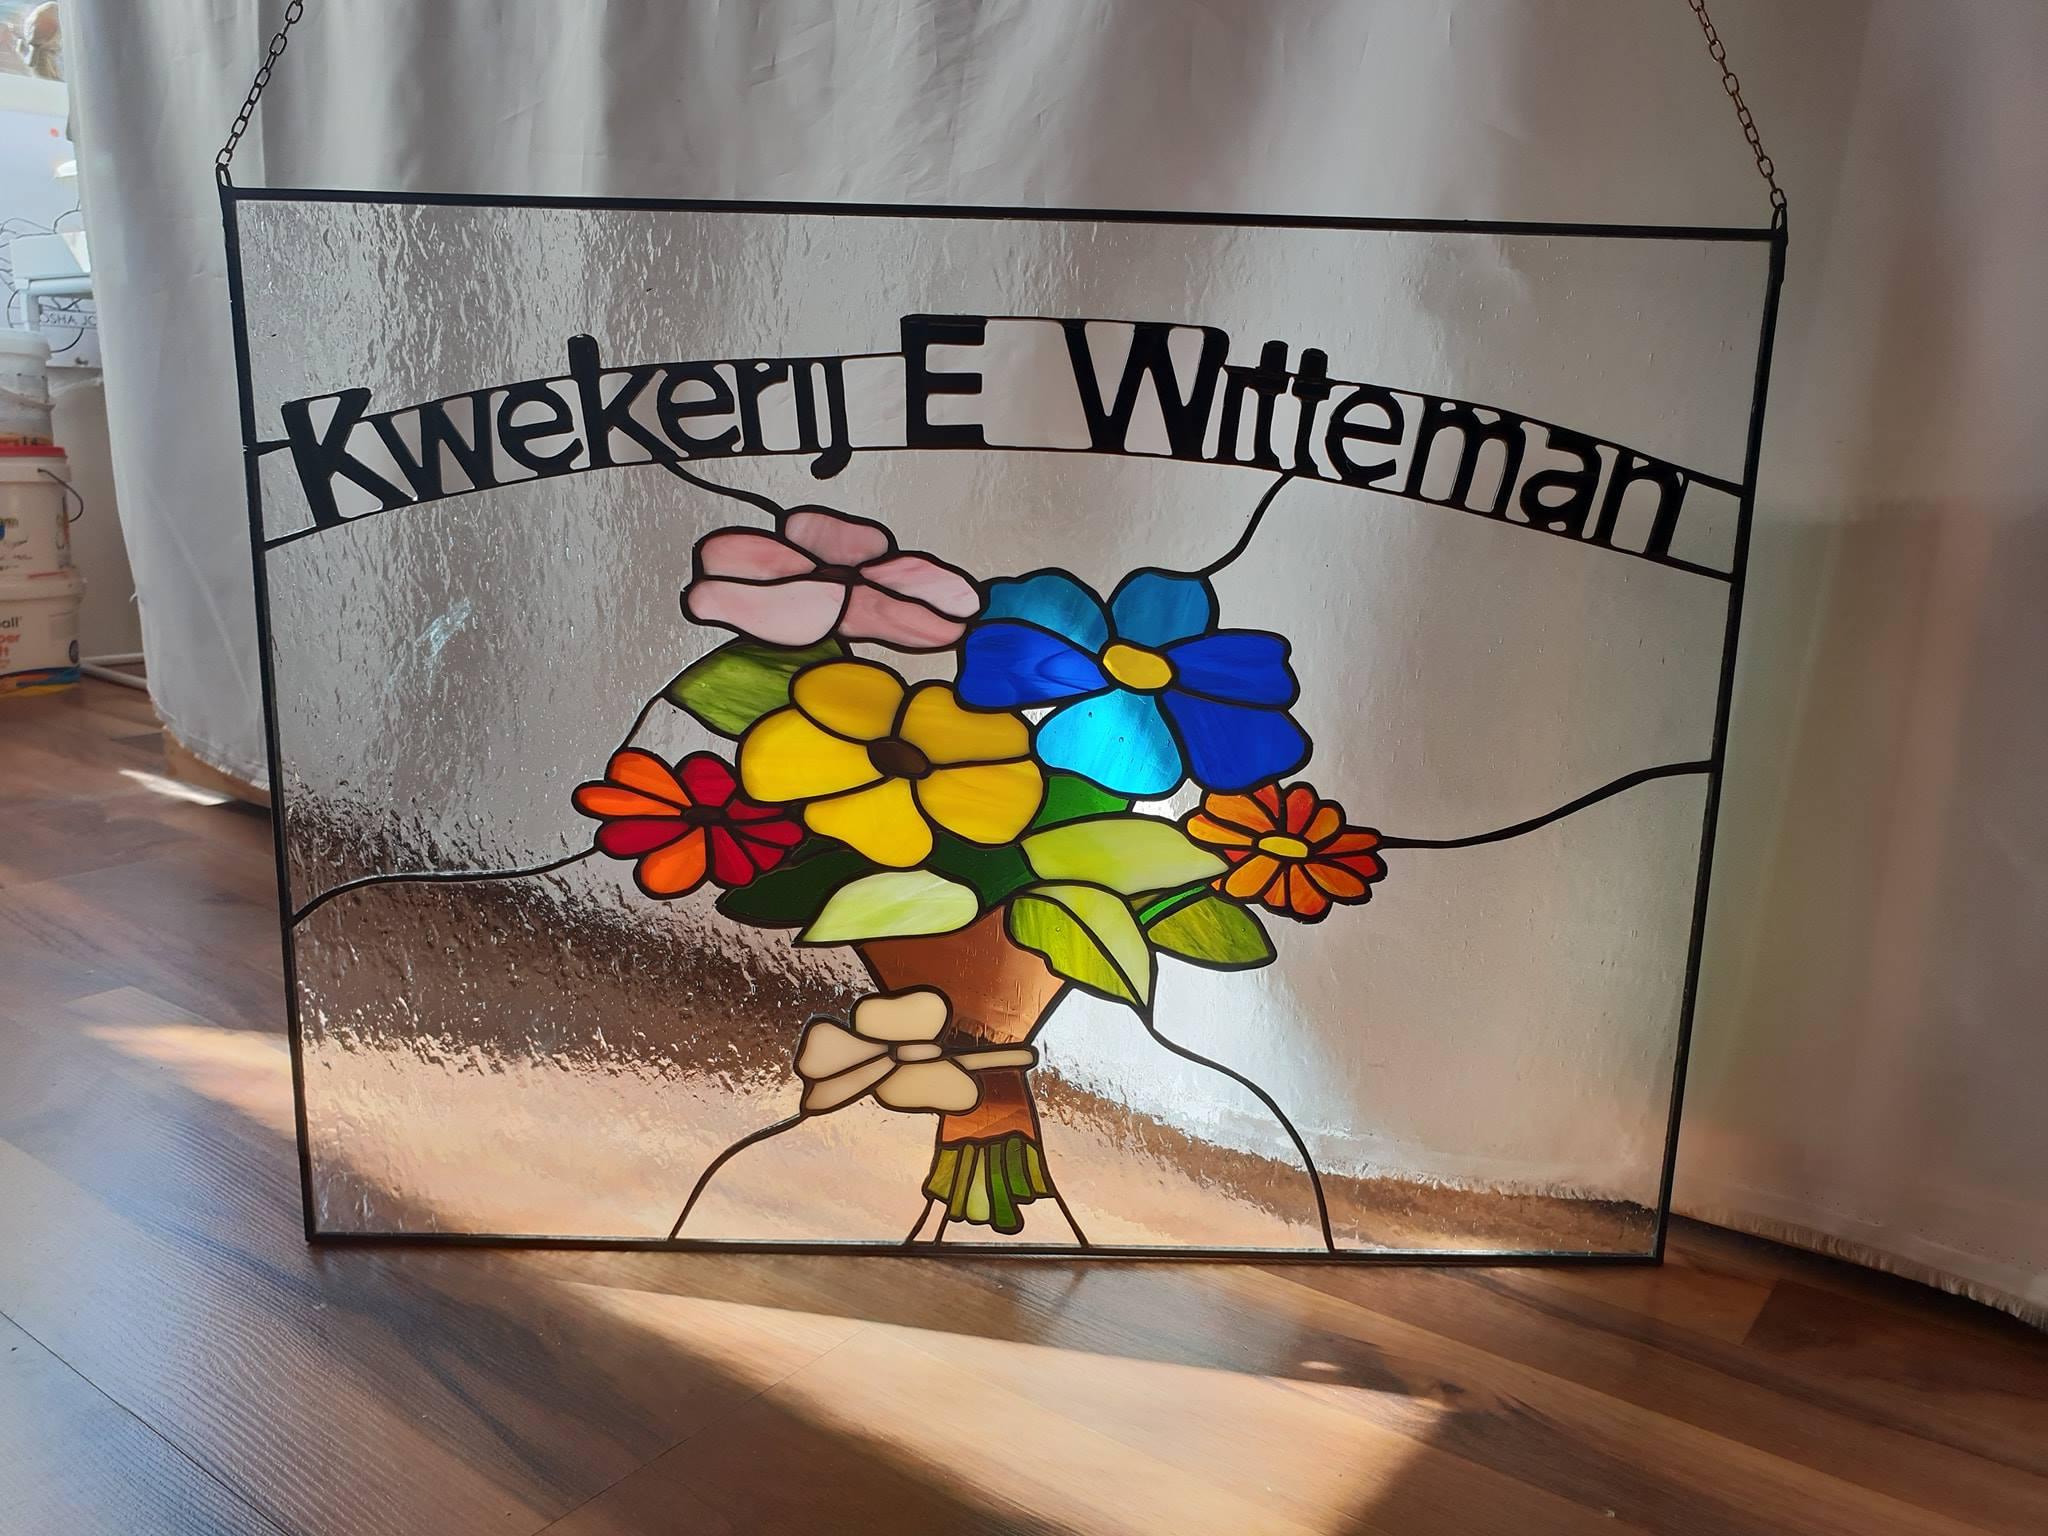 Kwekerij Witteman logo